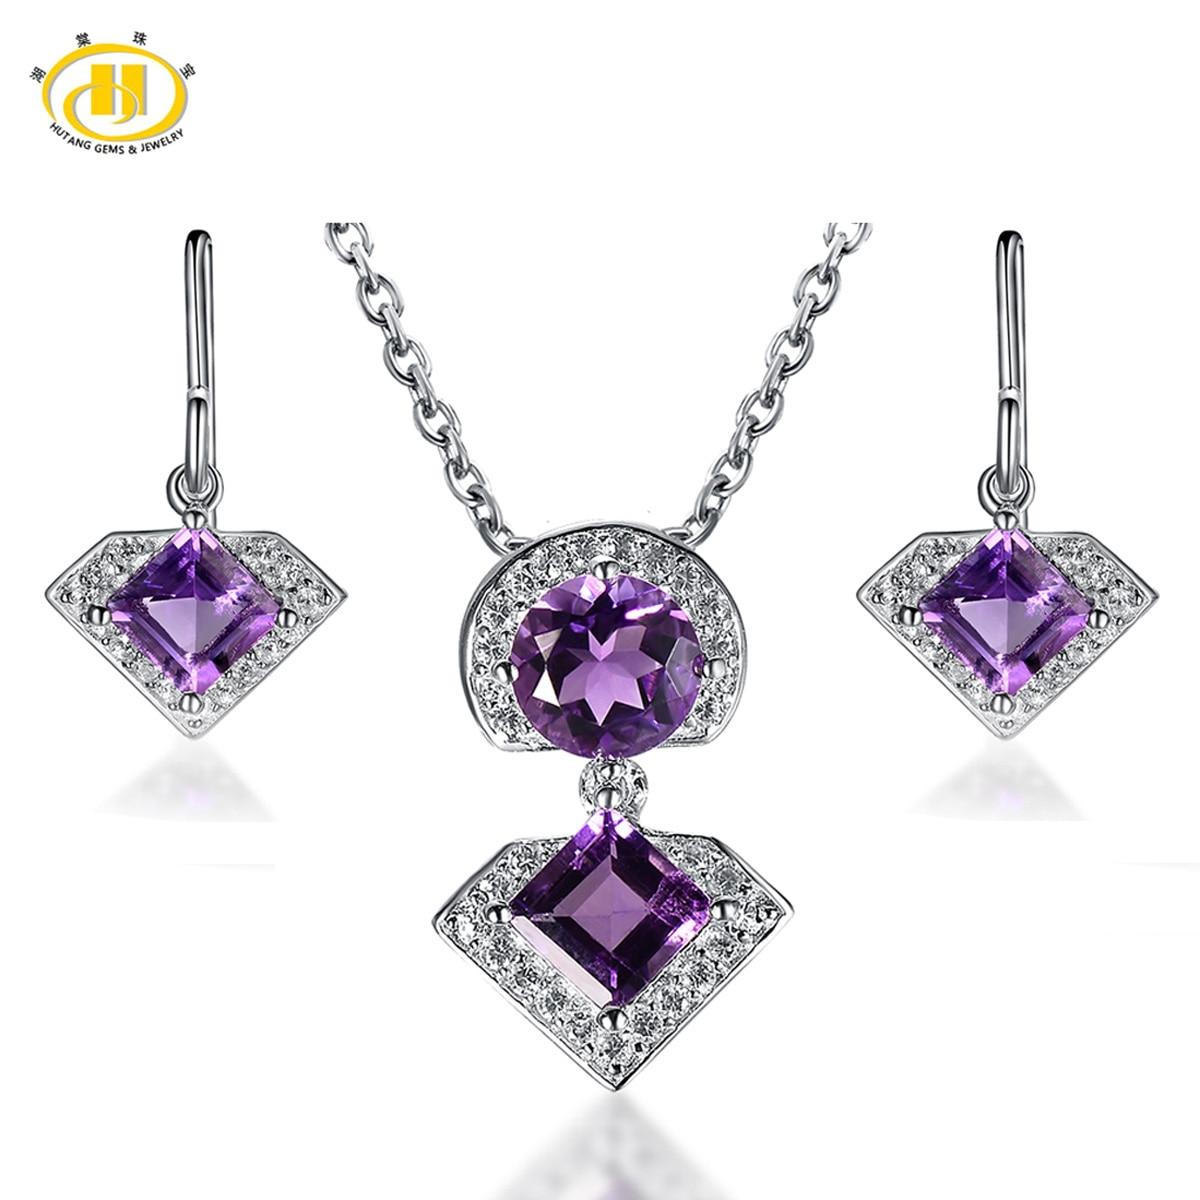 Hutang Diamond-Jewelry Sets Geometric Amethyst Stone Maxi Necklaces & Pendants Earrings for Women Fine 925 Silver Choker Earing chic multilayered geometric bullets choker page 2